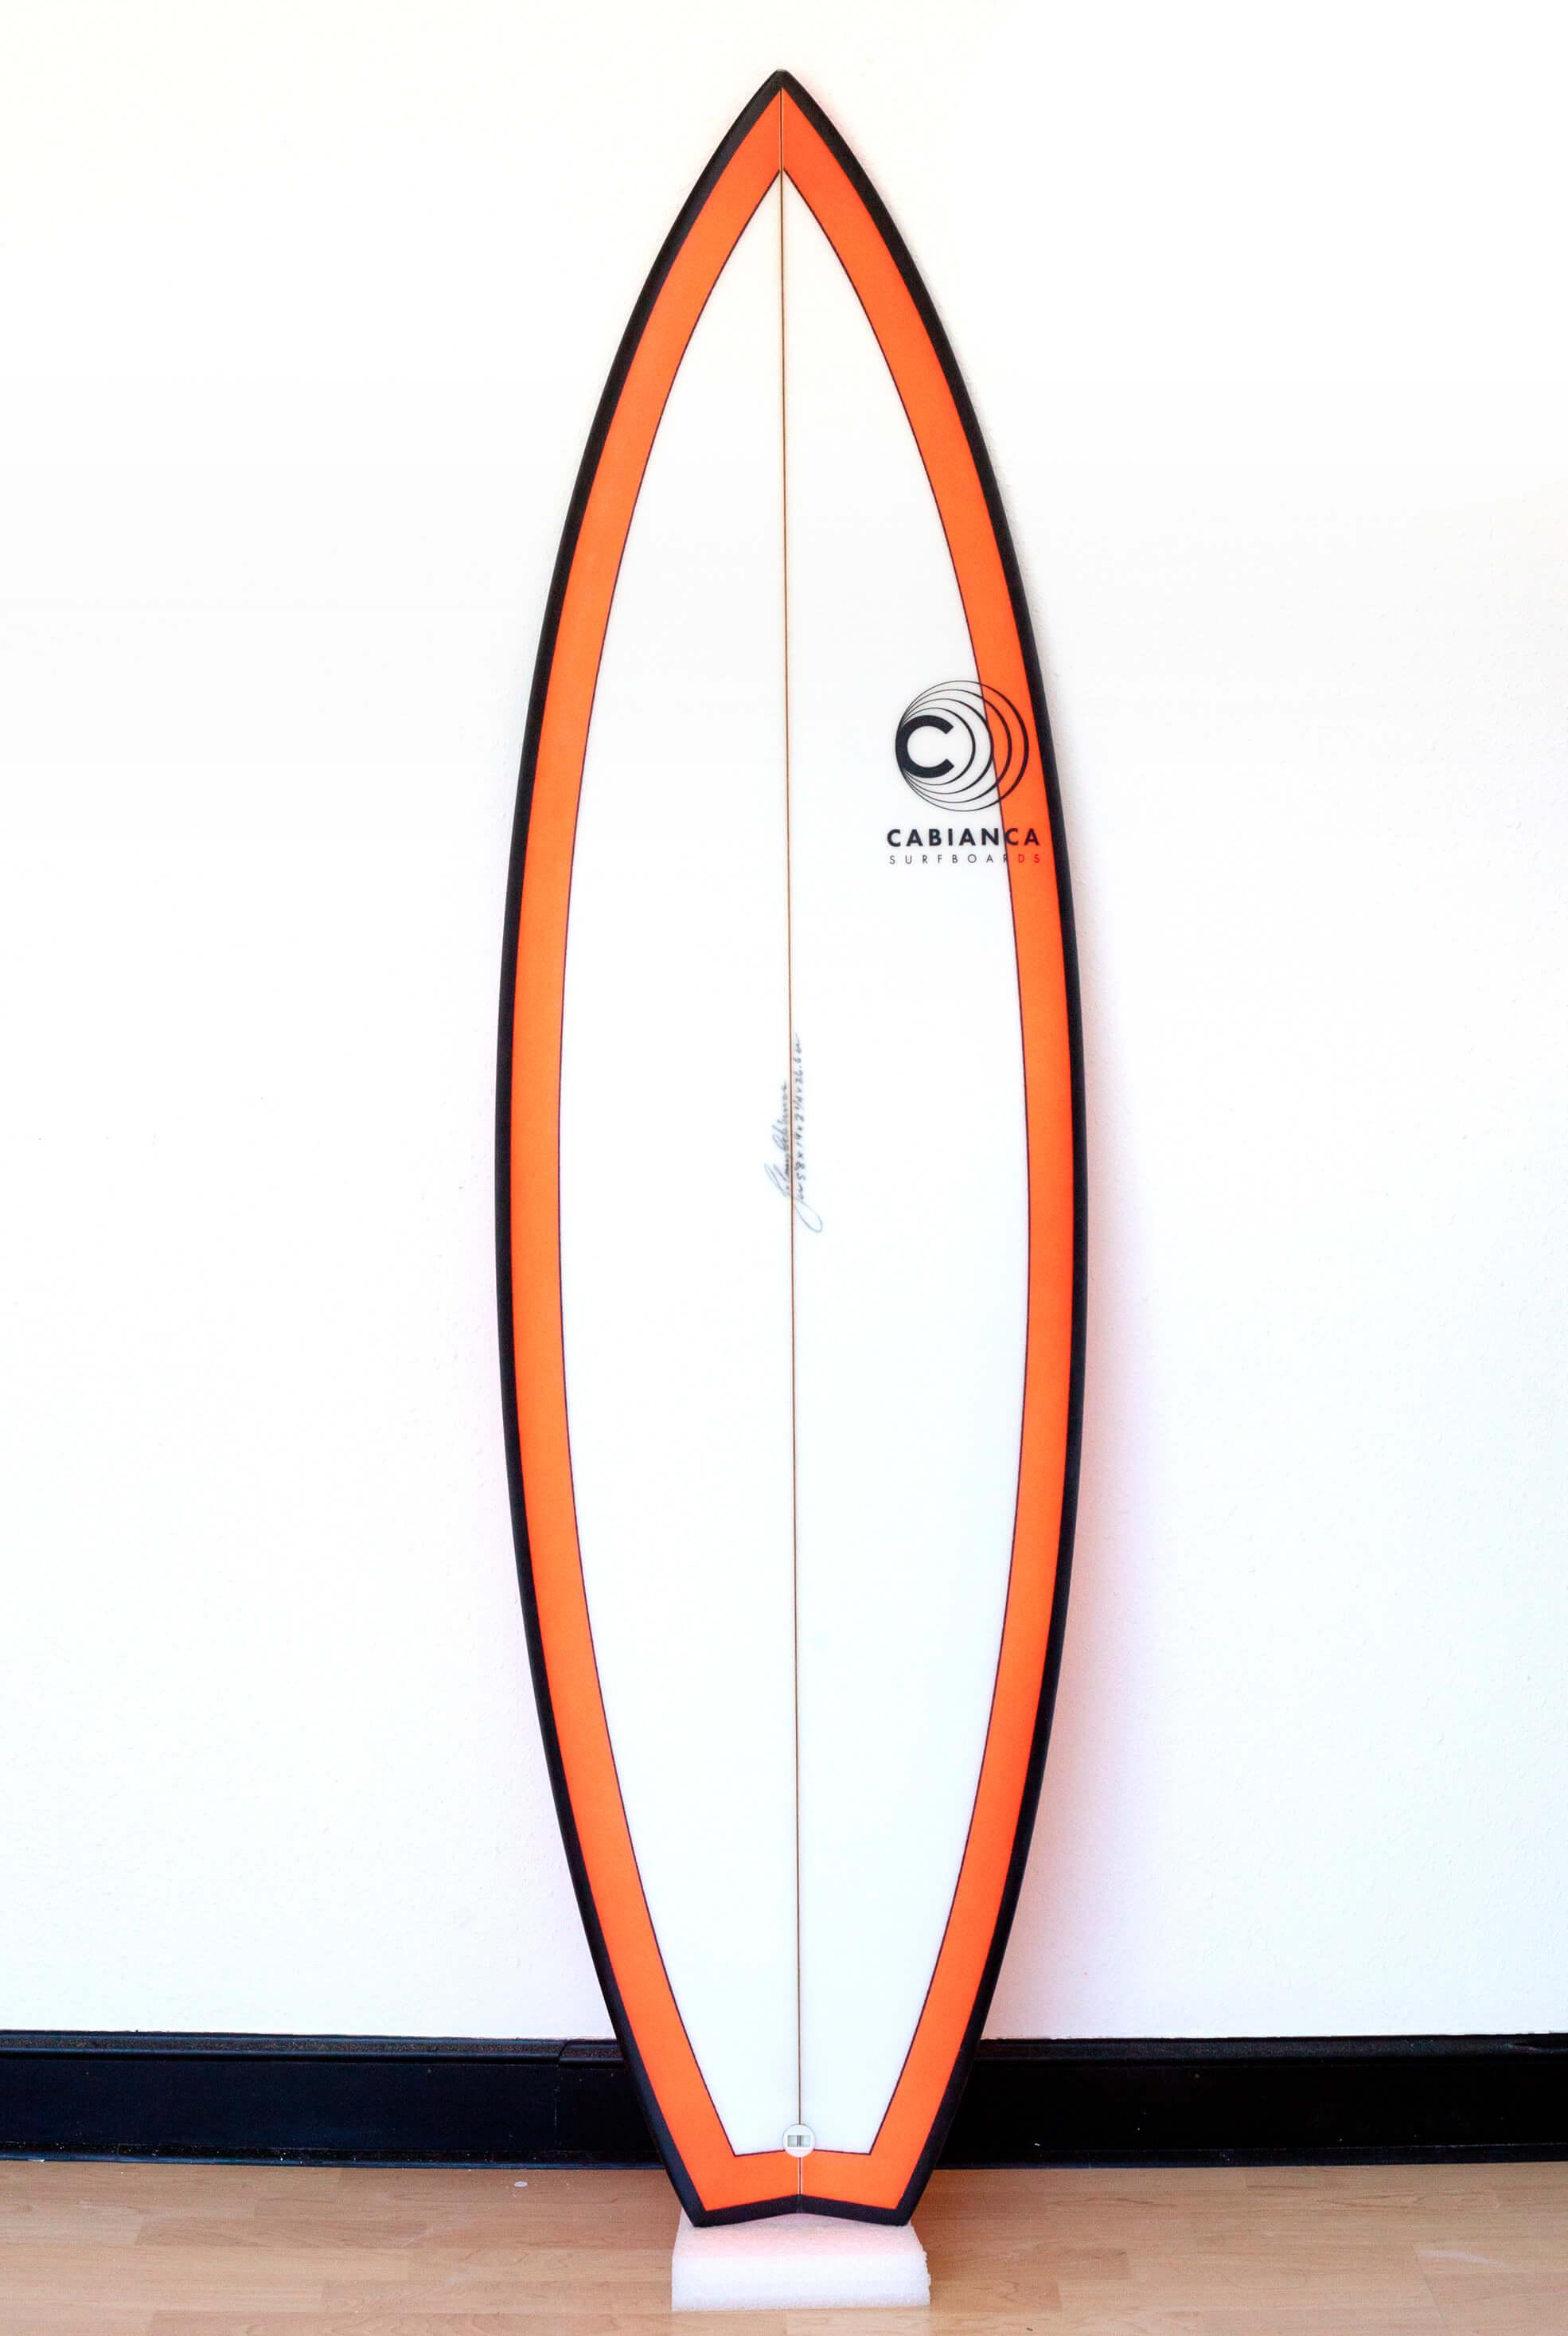 cabianca surfboards gabriel medina themedina shortboard